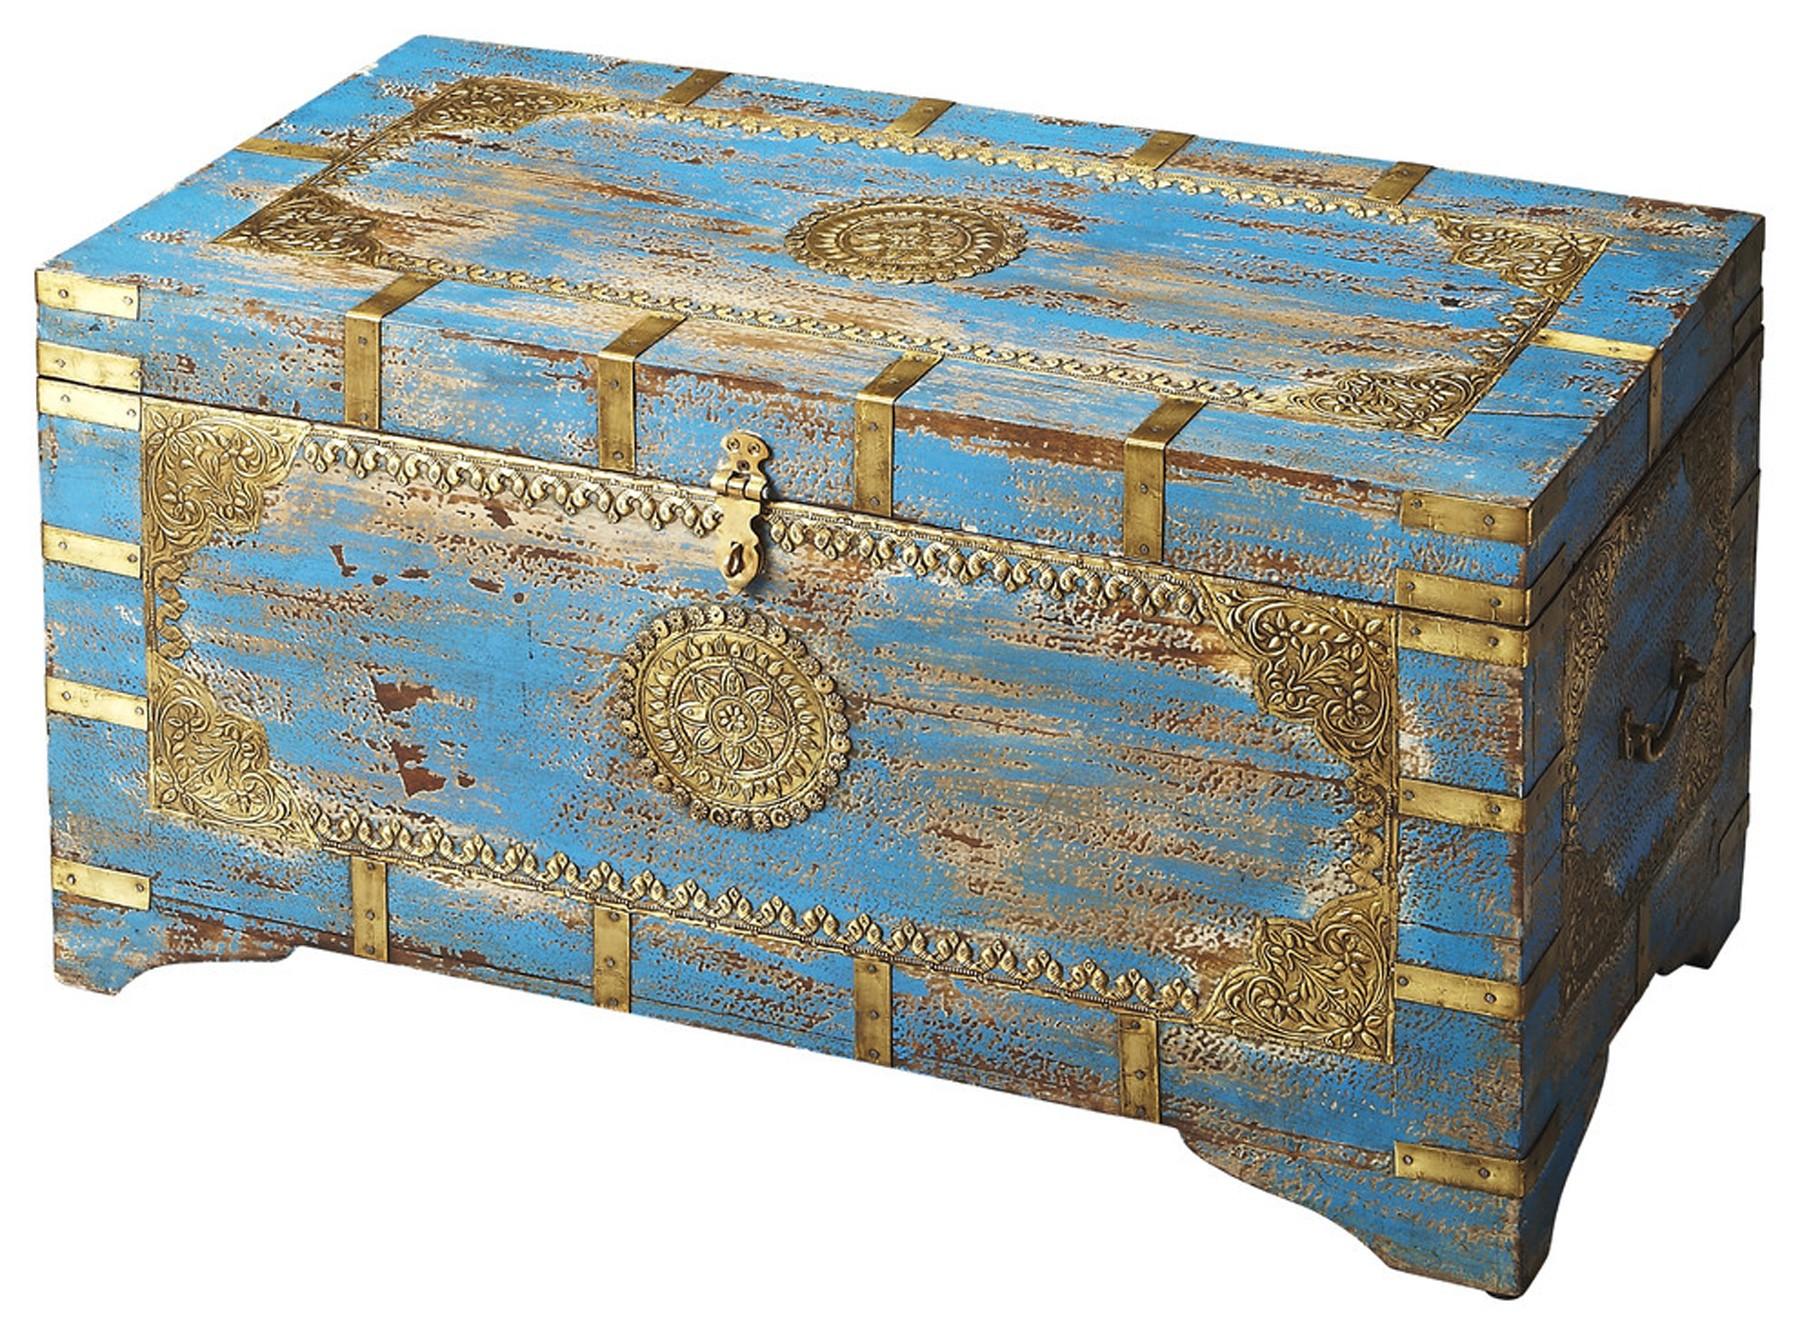 Neela Painted Brass Inlay Storage Trunk